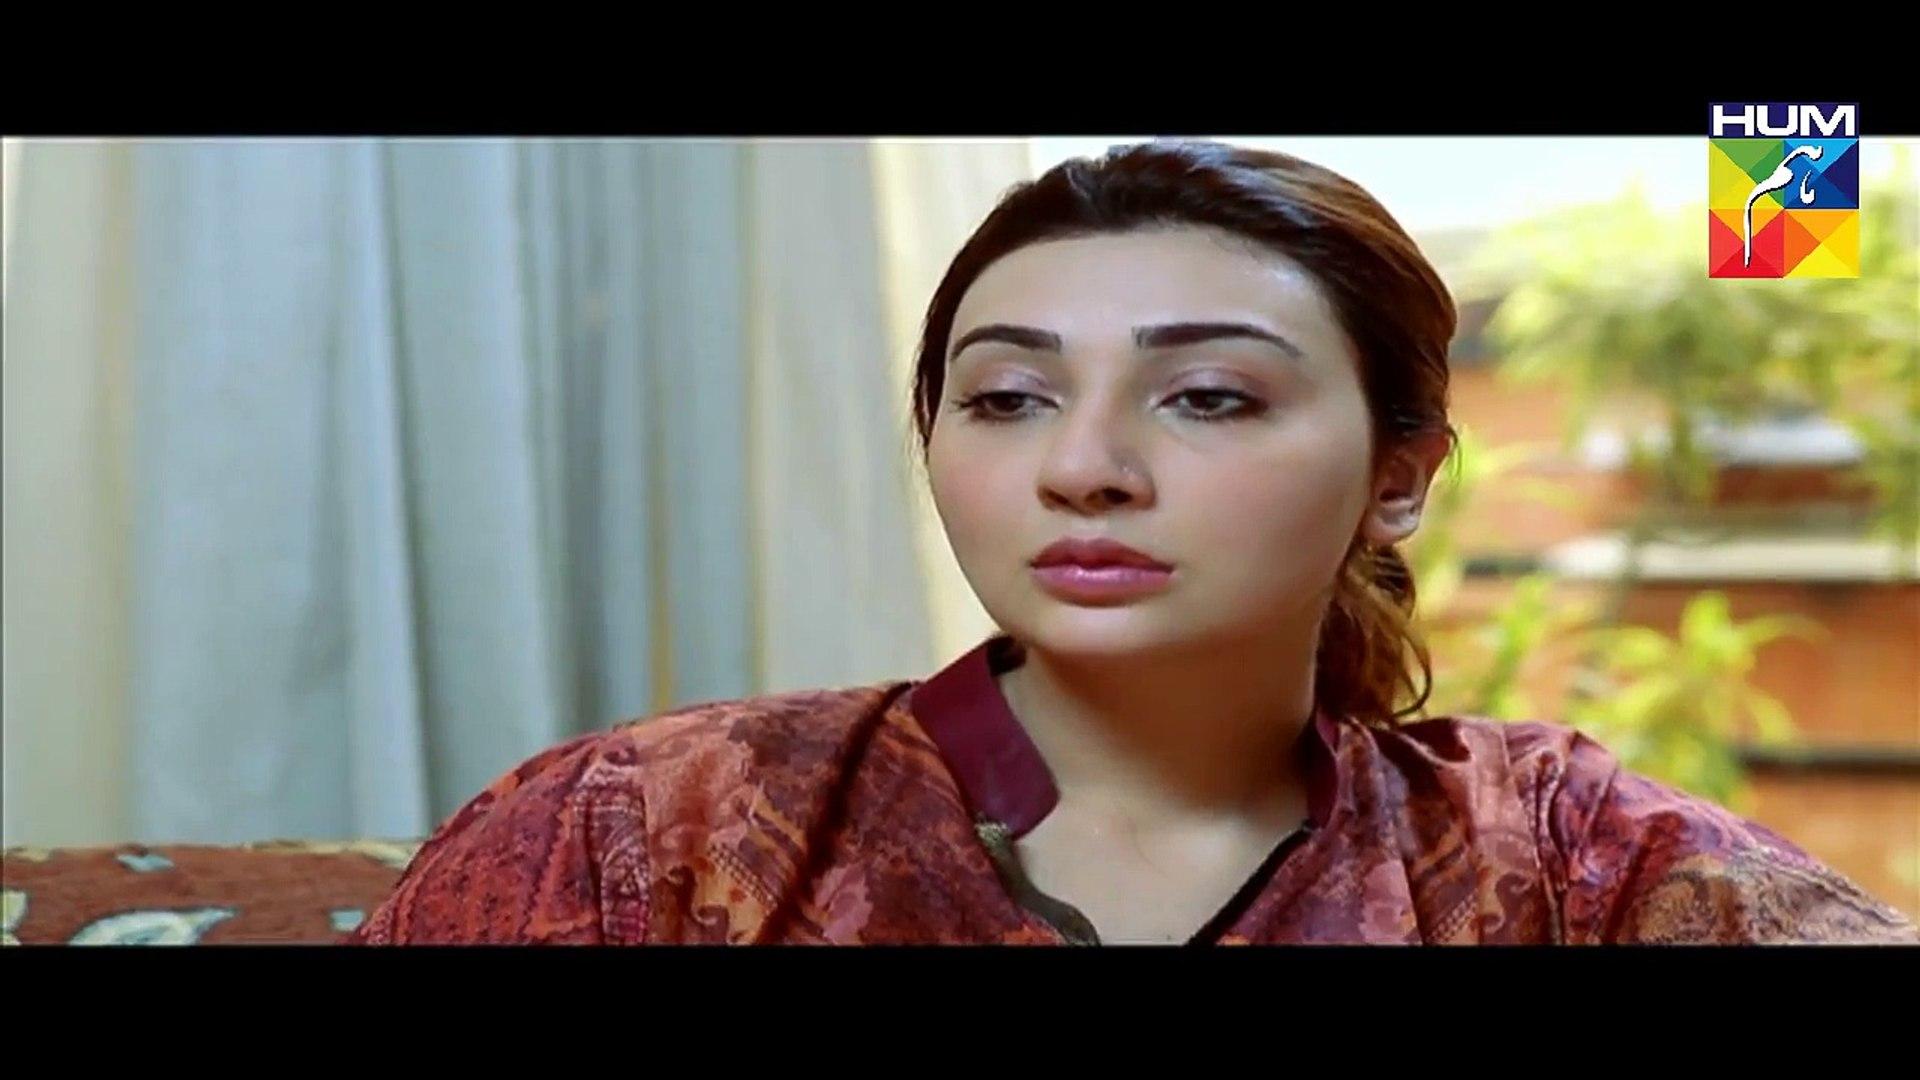 Tumhare Siwa Episode 15 Full Hum Tv Drama December 4, 2015